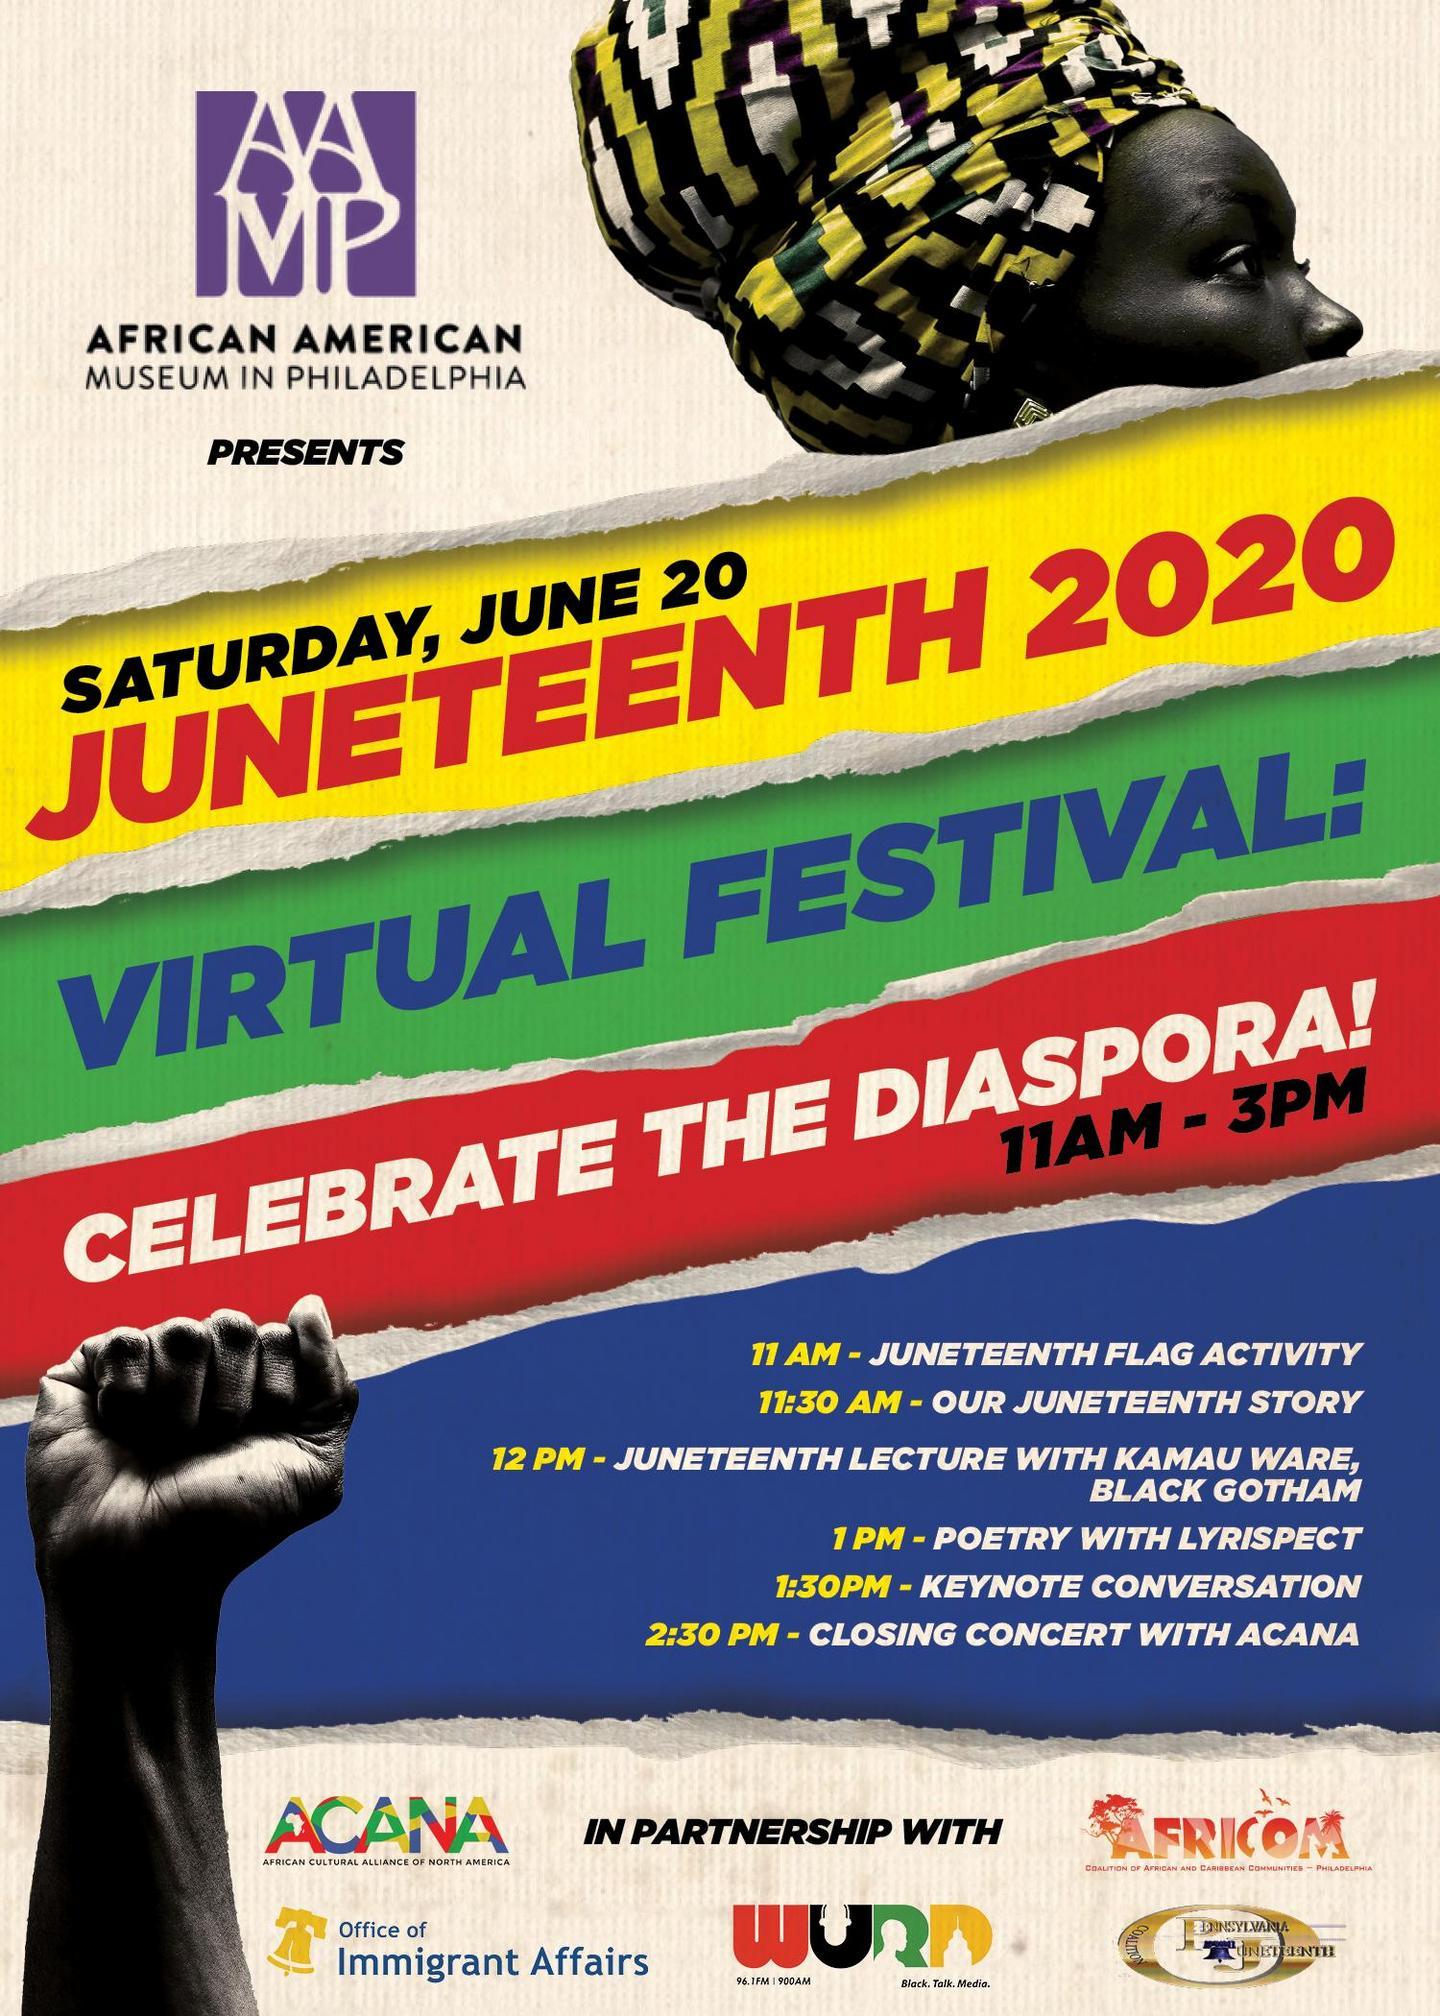 Juneteenth 2020 Virtual Festival: Celebrate the Diaspora!